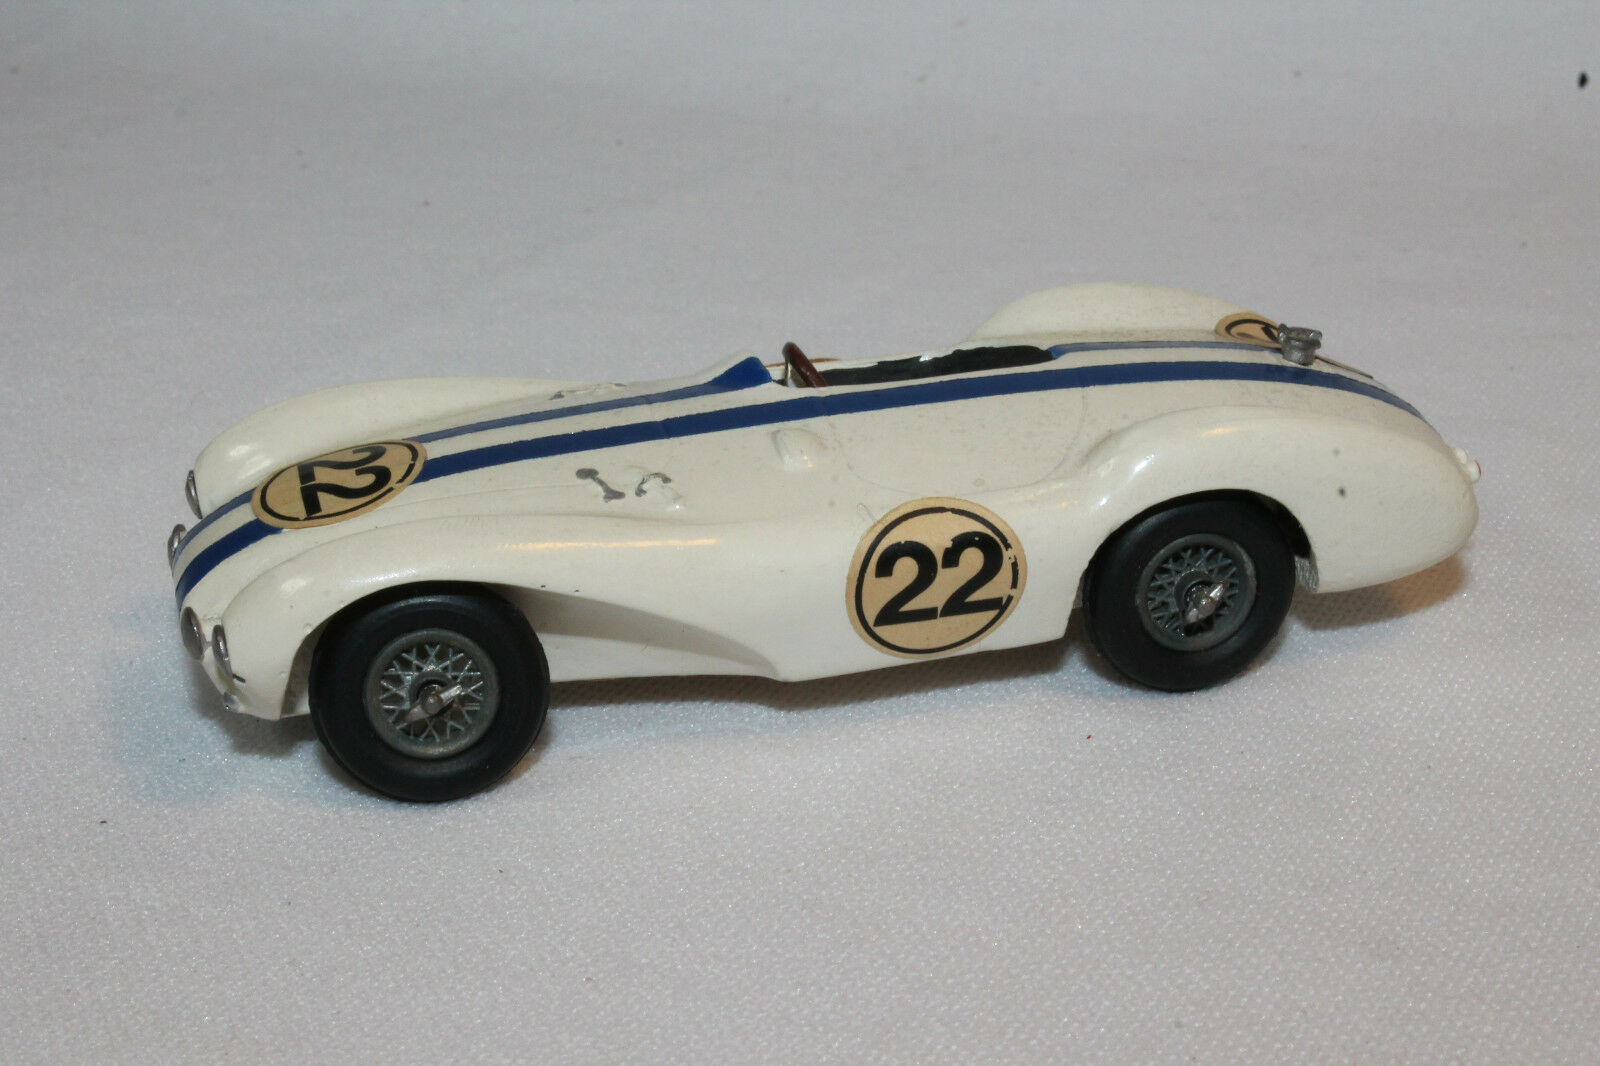 B.T.S. Le Mans Replicas 1954 Aston Martin DB3S, Resin Cast 1 43 Scale